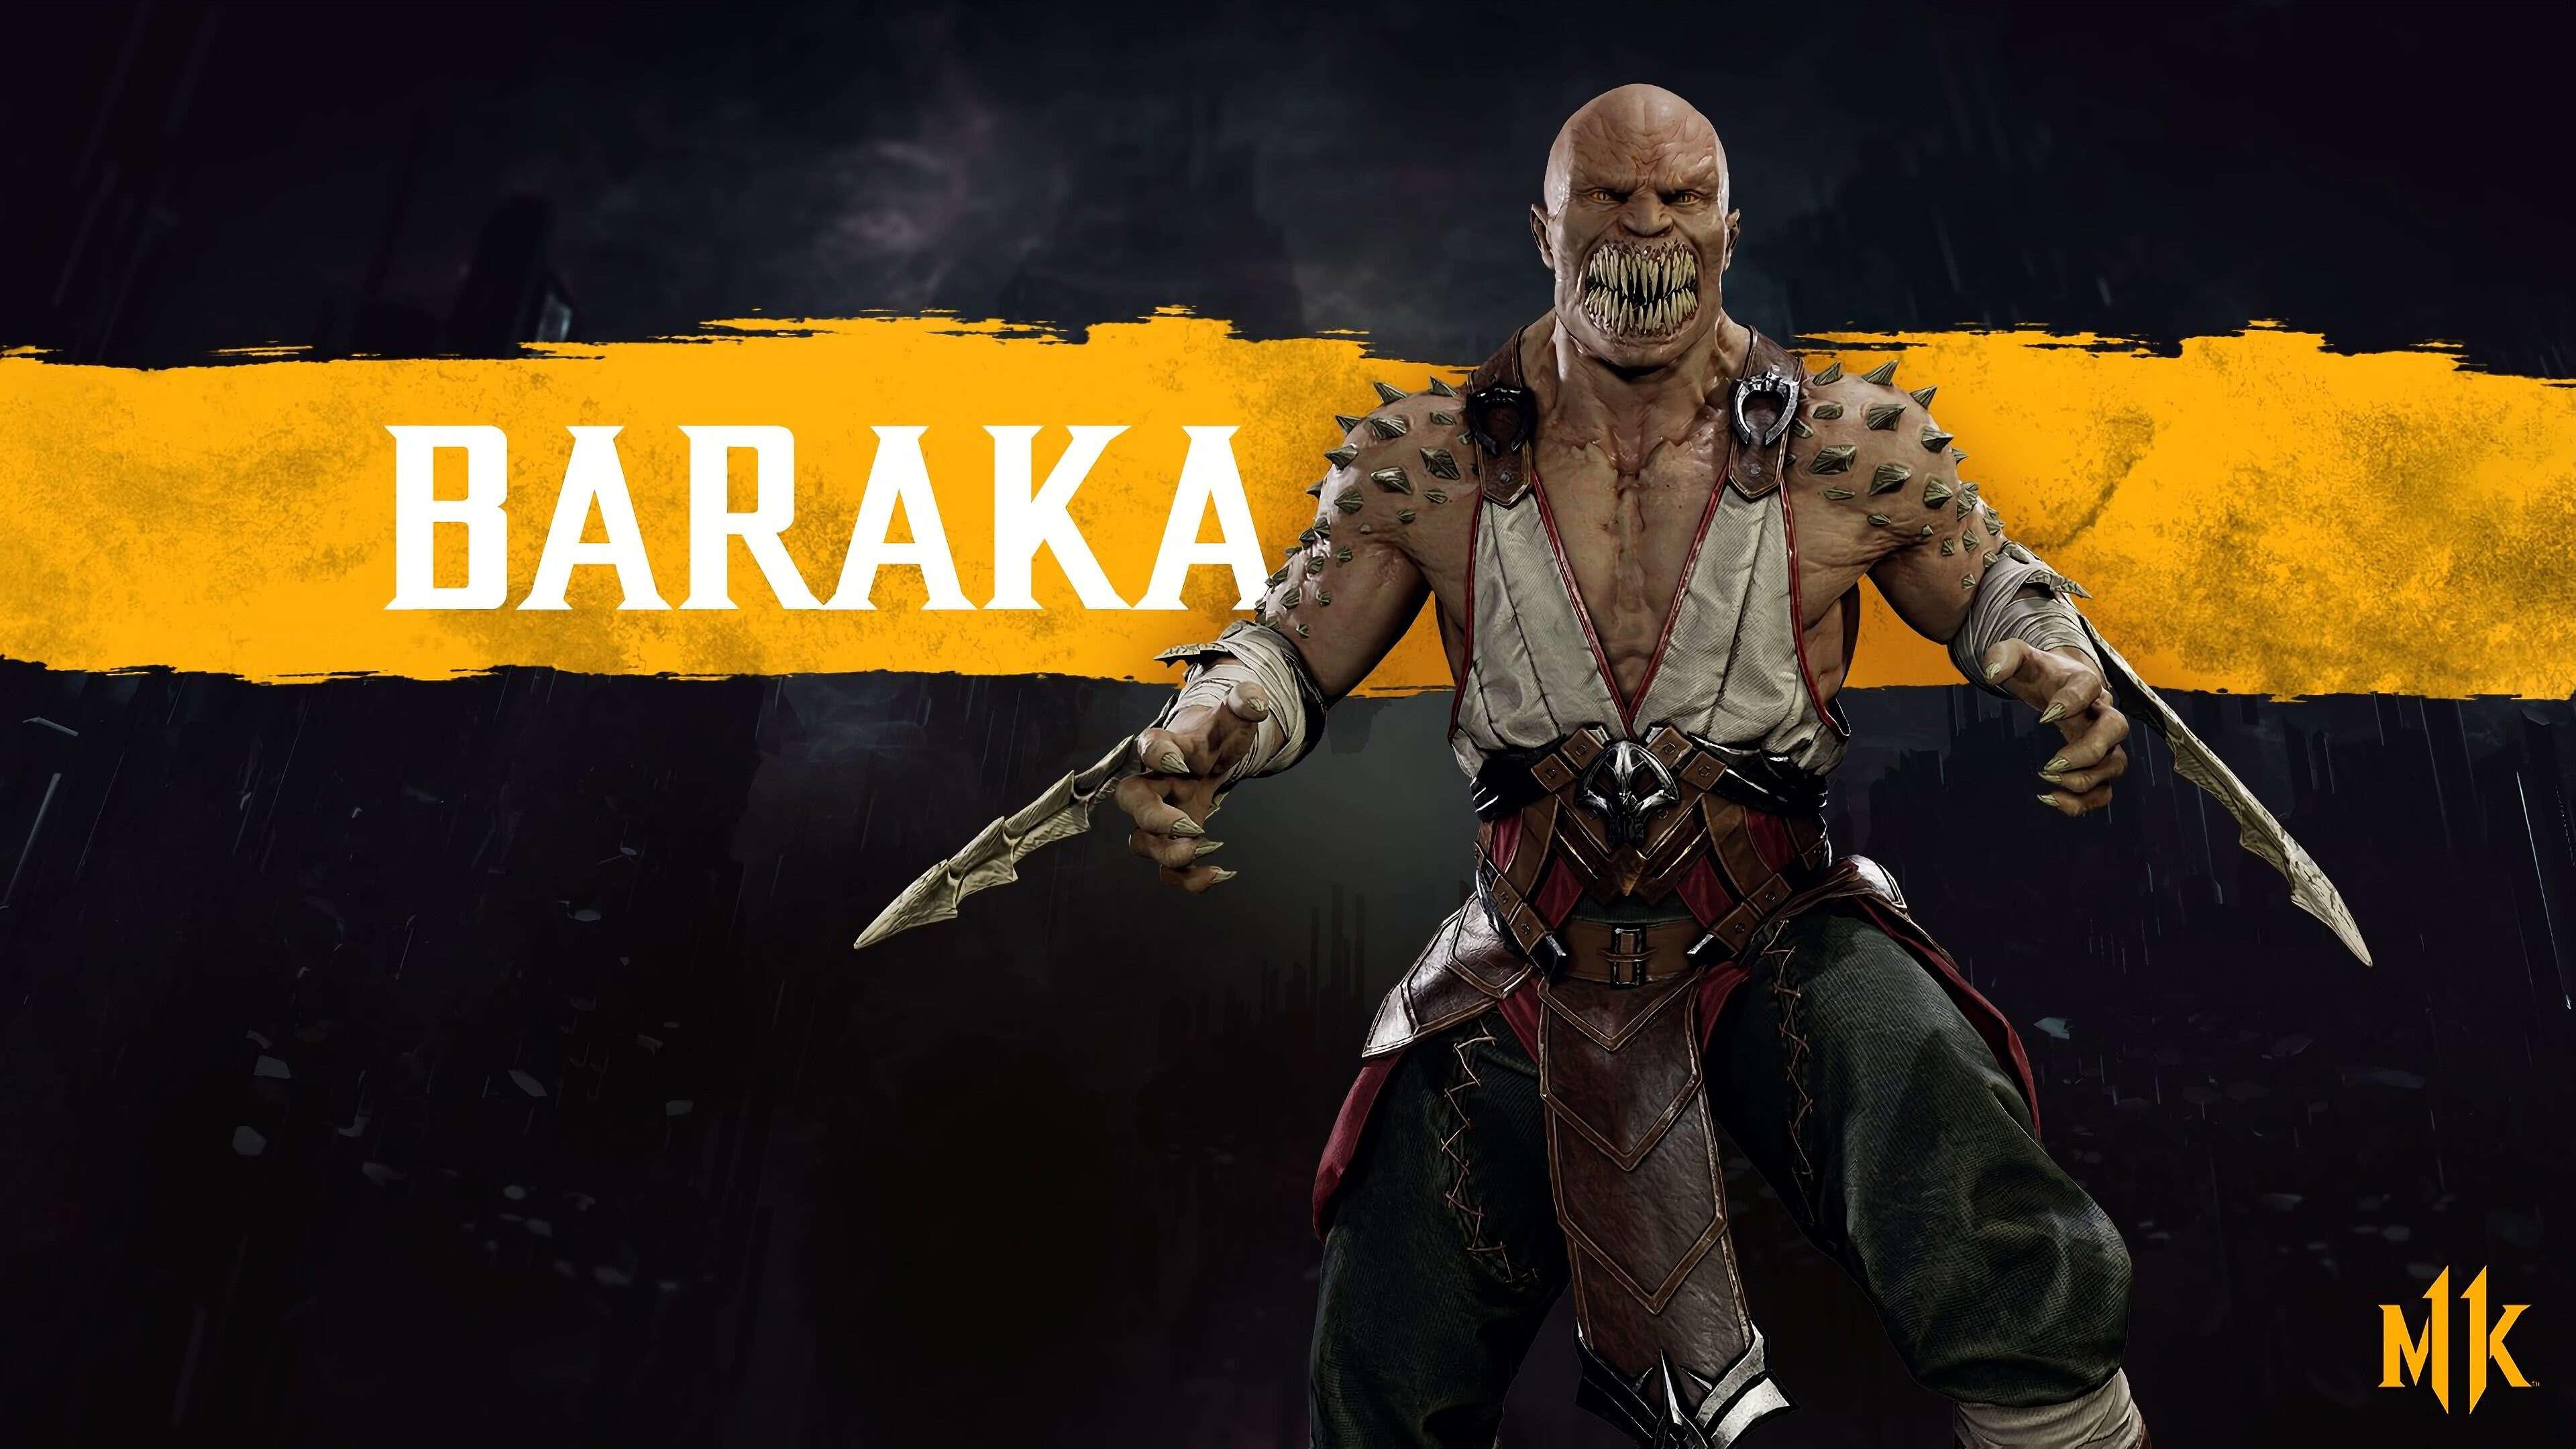 Mortal Kombat 11 Baraka Uhd 4k Wallpaper Pixelz